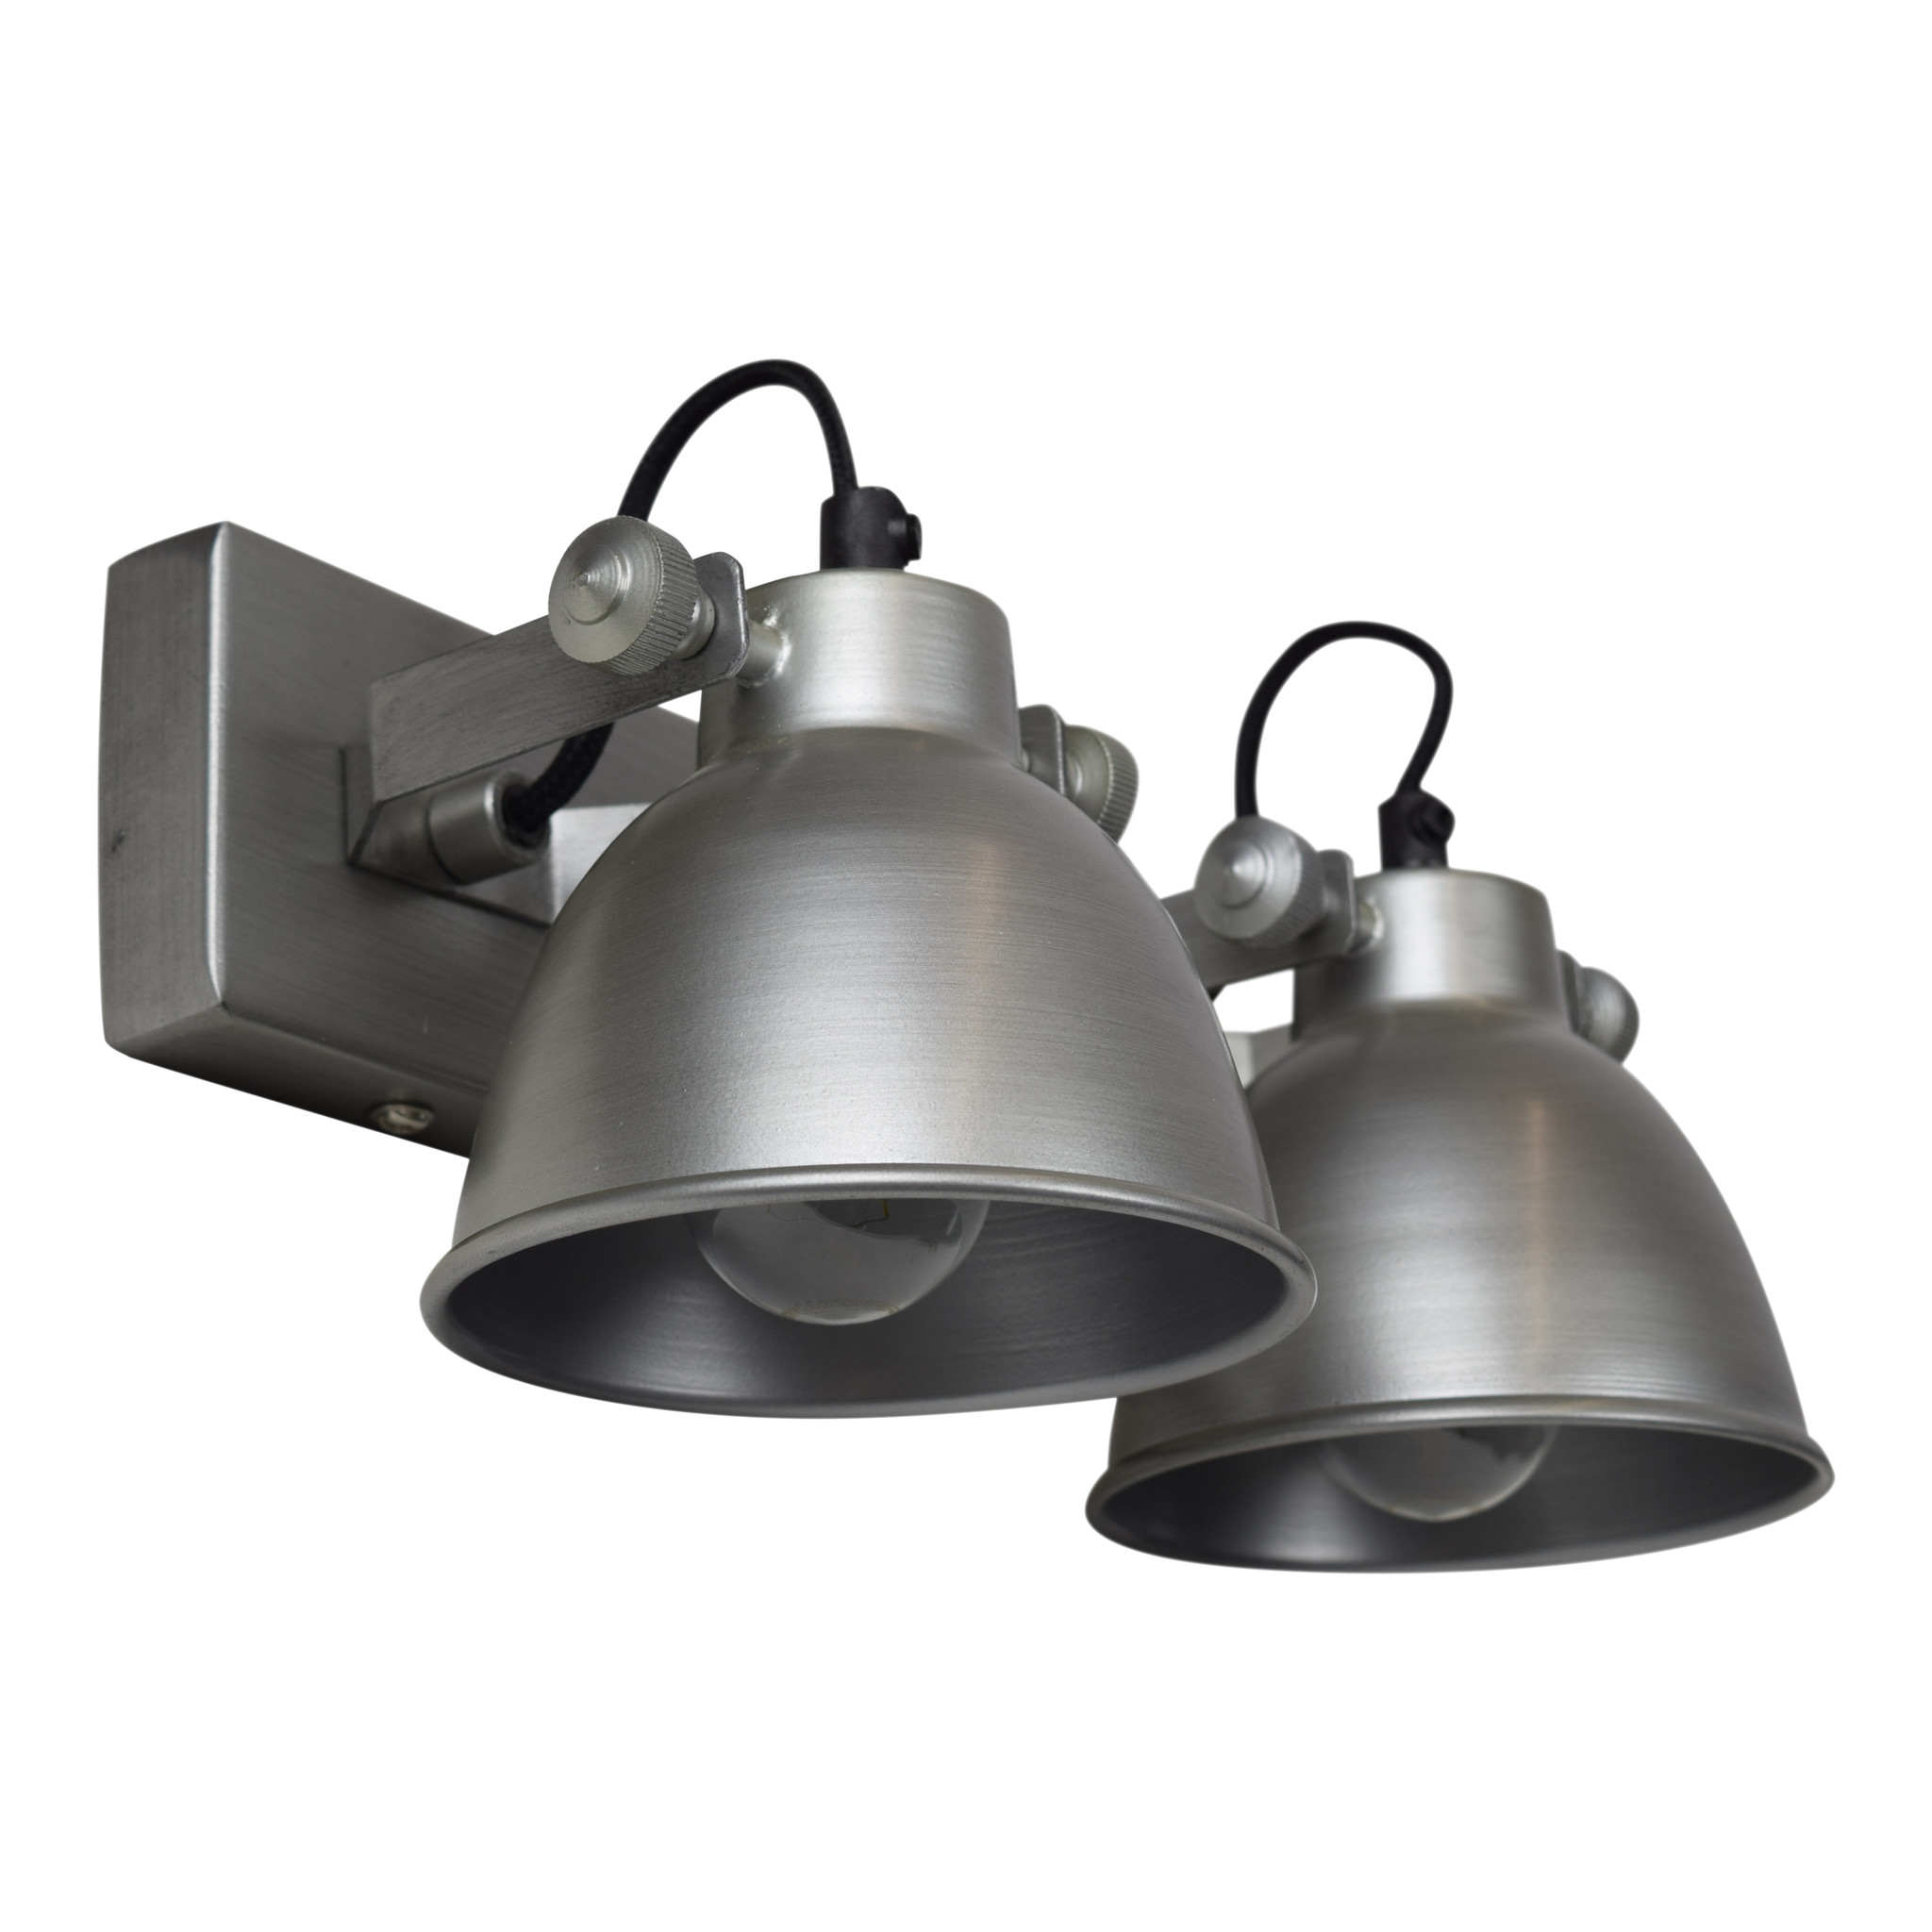 Urban Interiors Urban Interiors Wandlamp industrial double antique zink-AI-WL-DBL-21-AZ-8719325005462